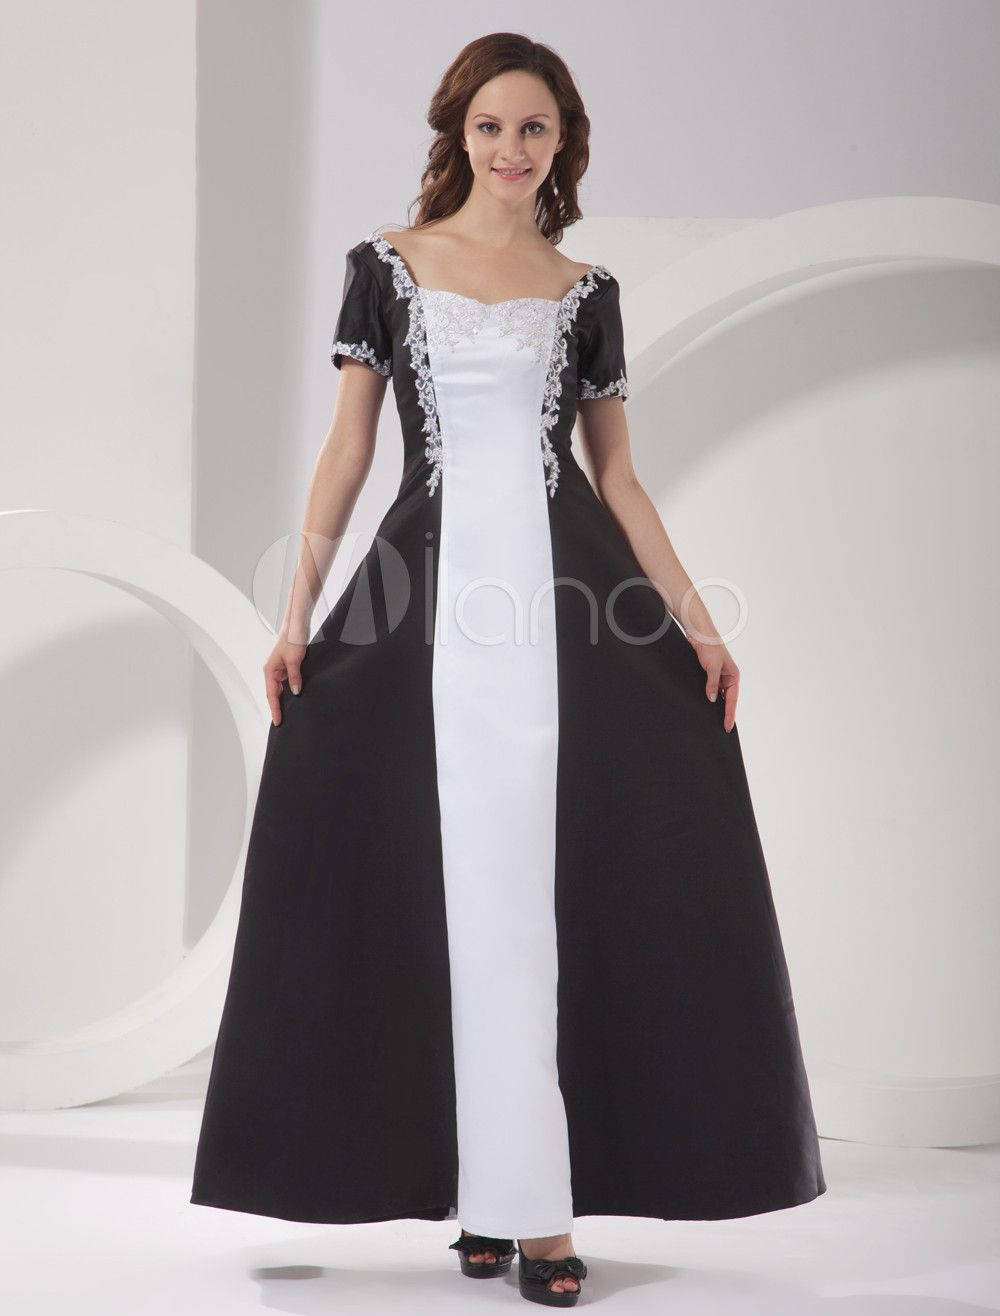 Milanoo ltd mother of the bride dresses short sleeves